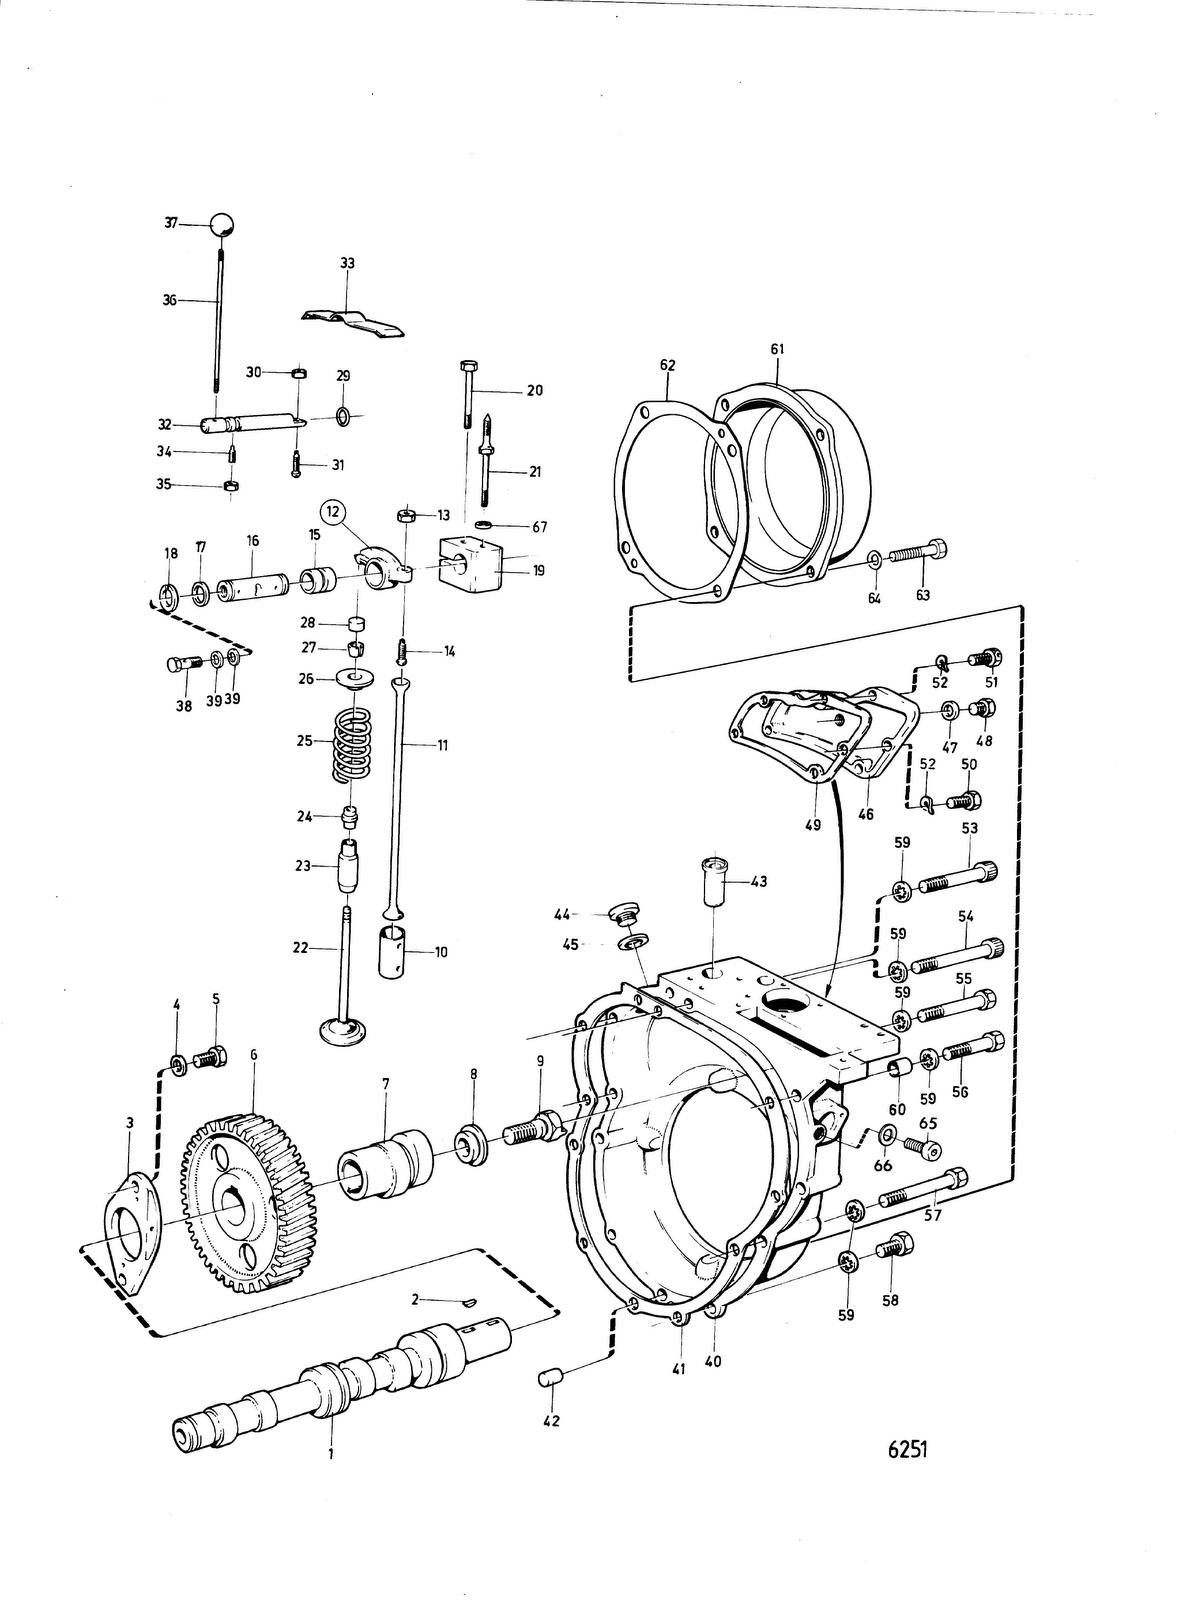 Volvo 940 Turbo Engine Diagram Besides Volvo 940 Turbo Engine Diagram